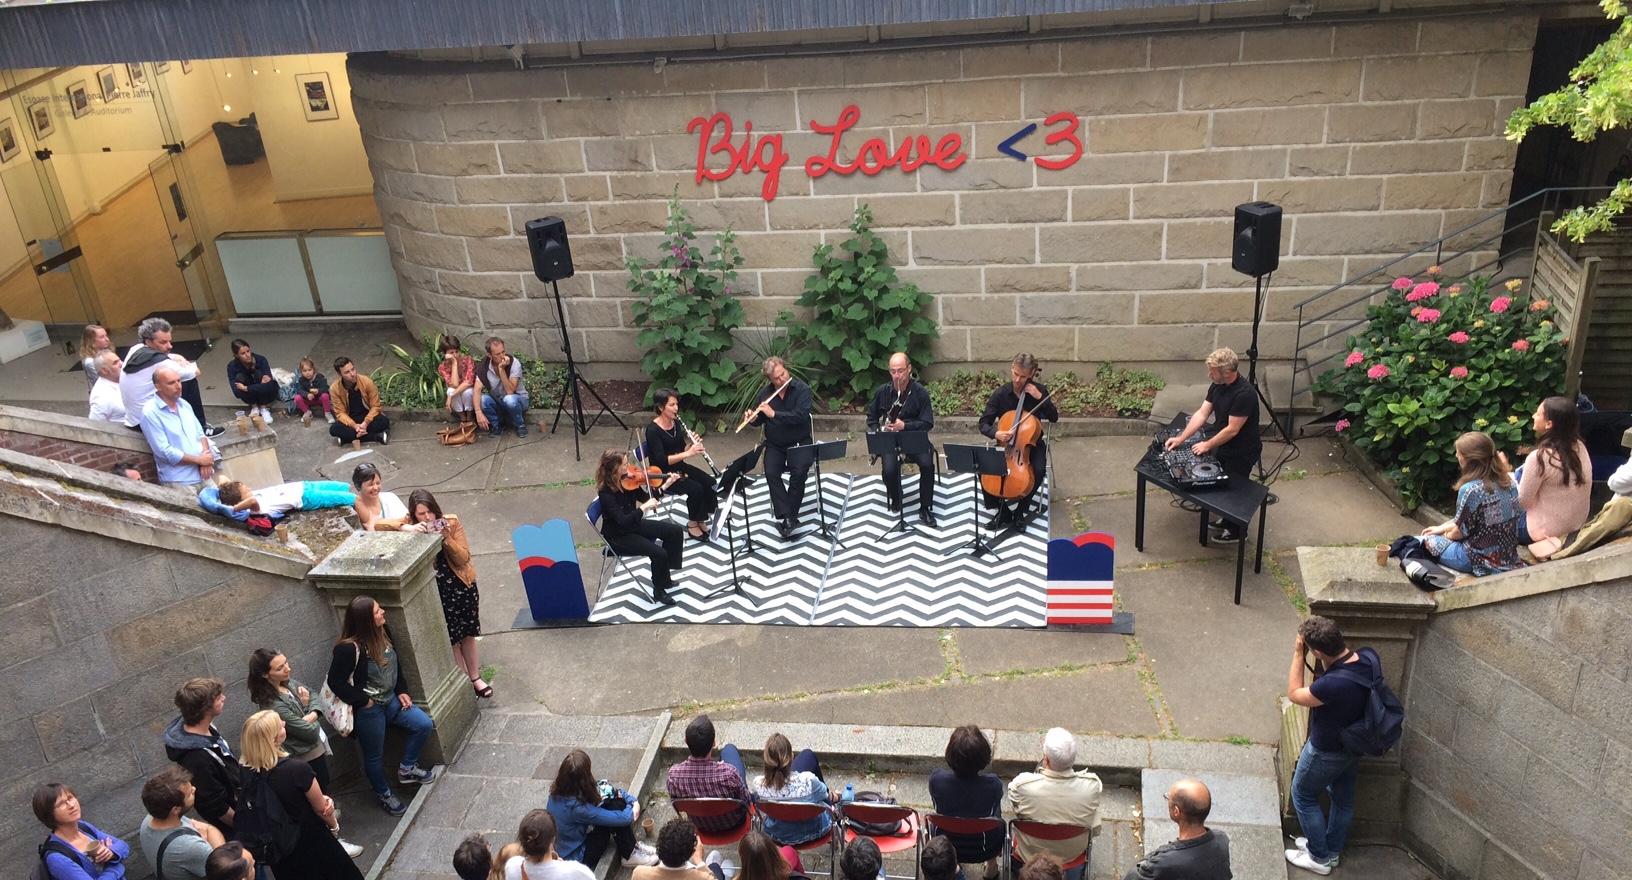 Biglove Festival Cour De L'Institut Musique Concert